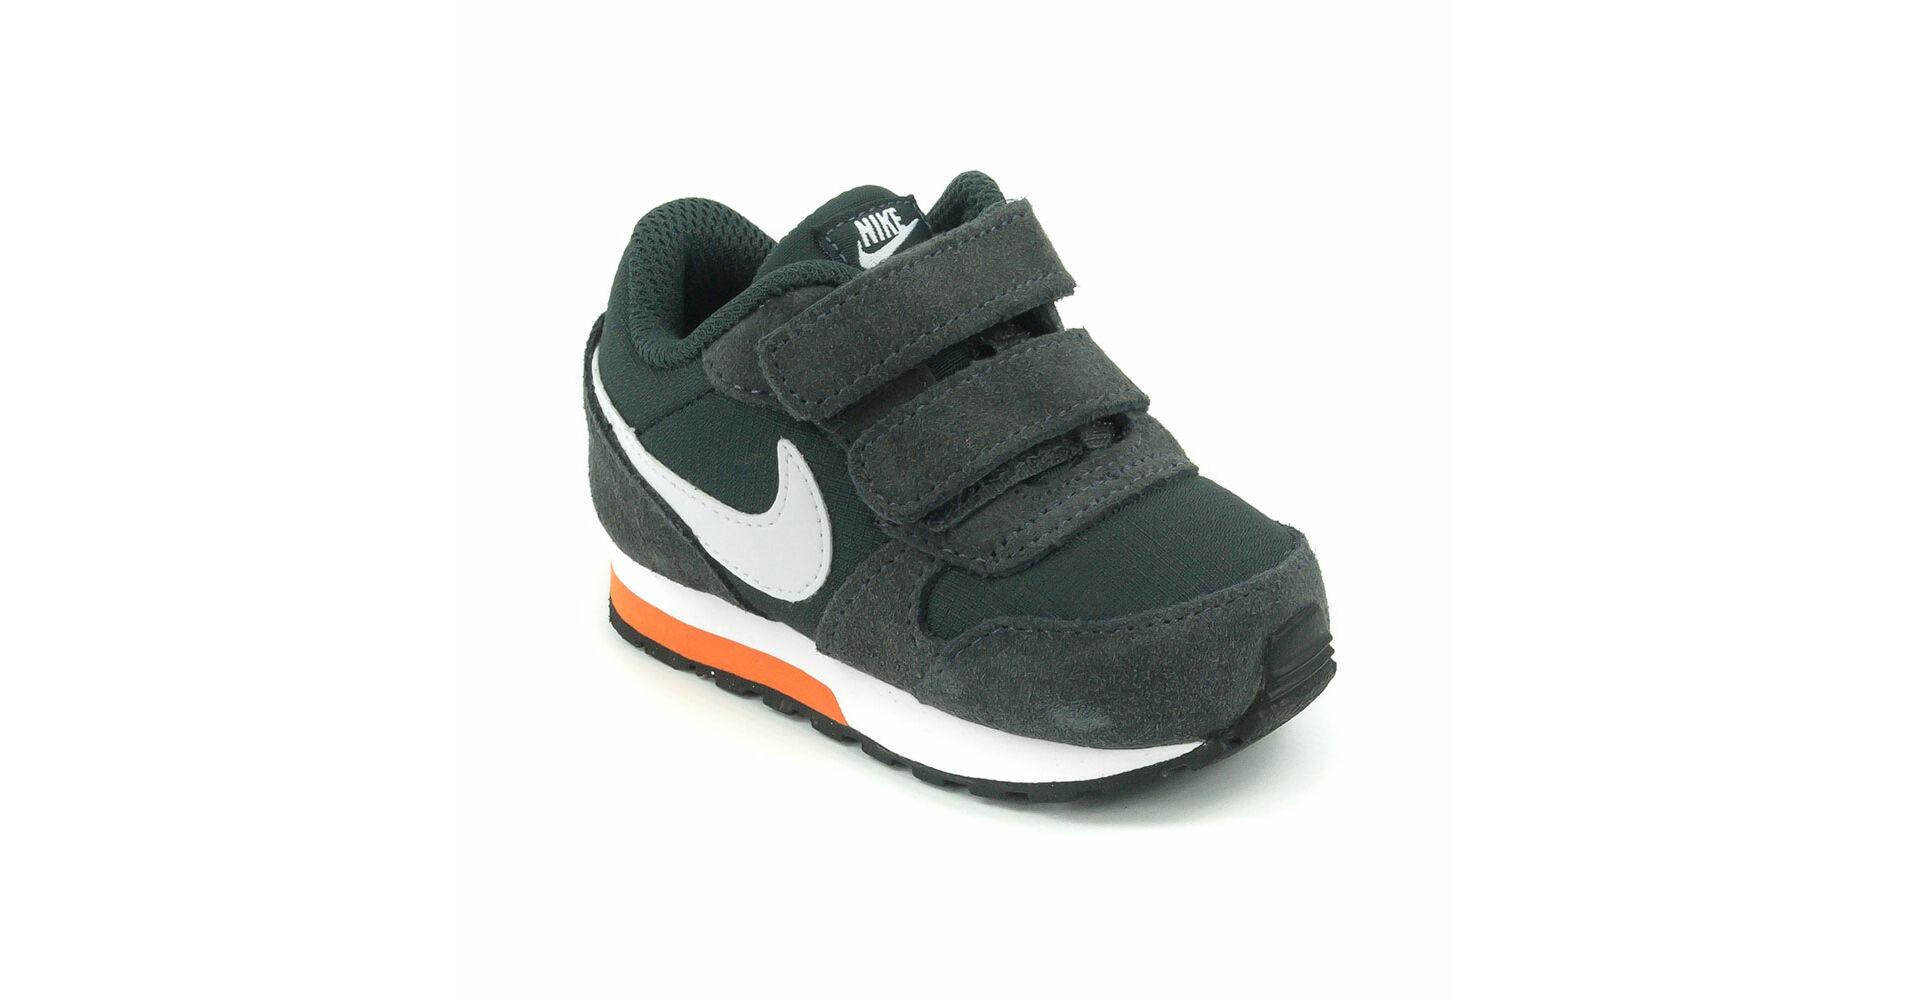 64d22a4c3702 Nike Md Runner 2 TDV Baby Fiú Sportcipő-806255-009 - MadeInPapp a  CipőWebáruház